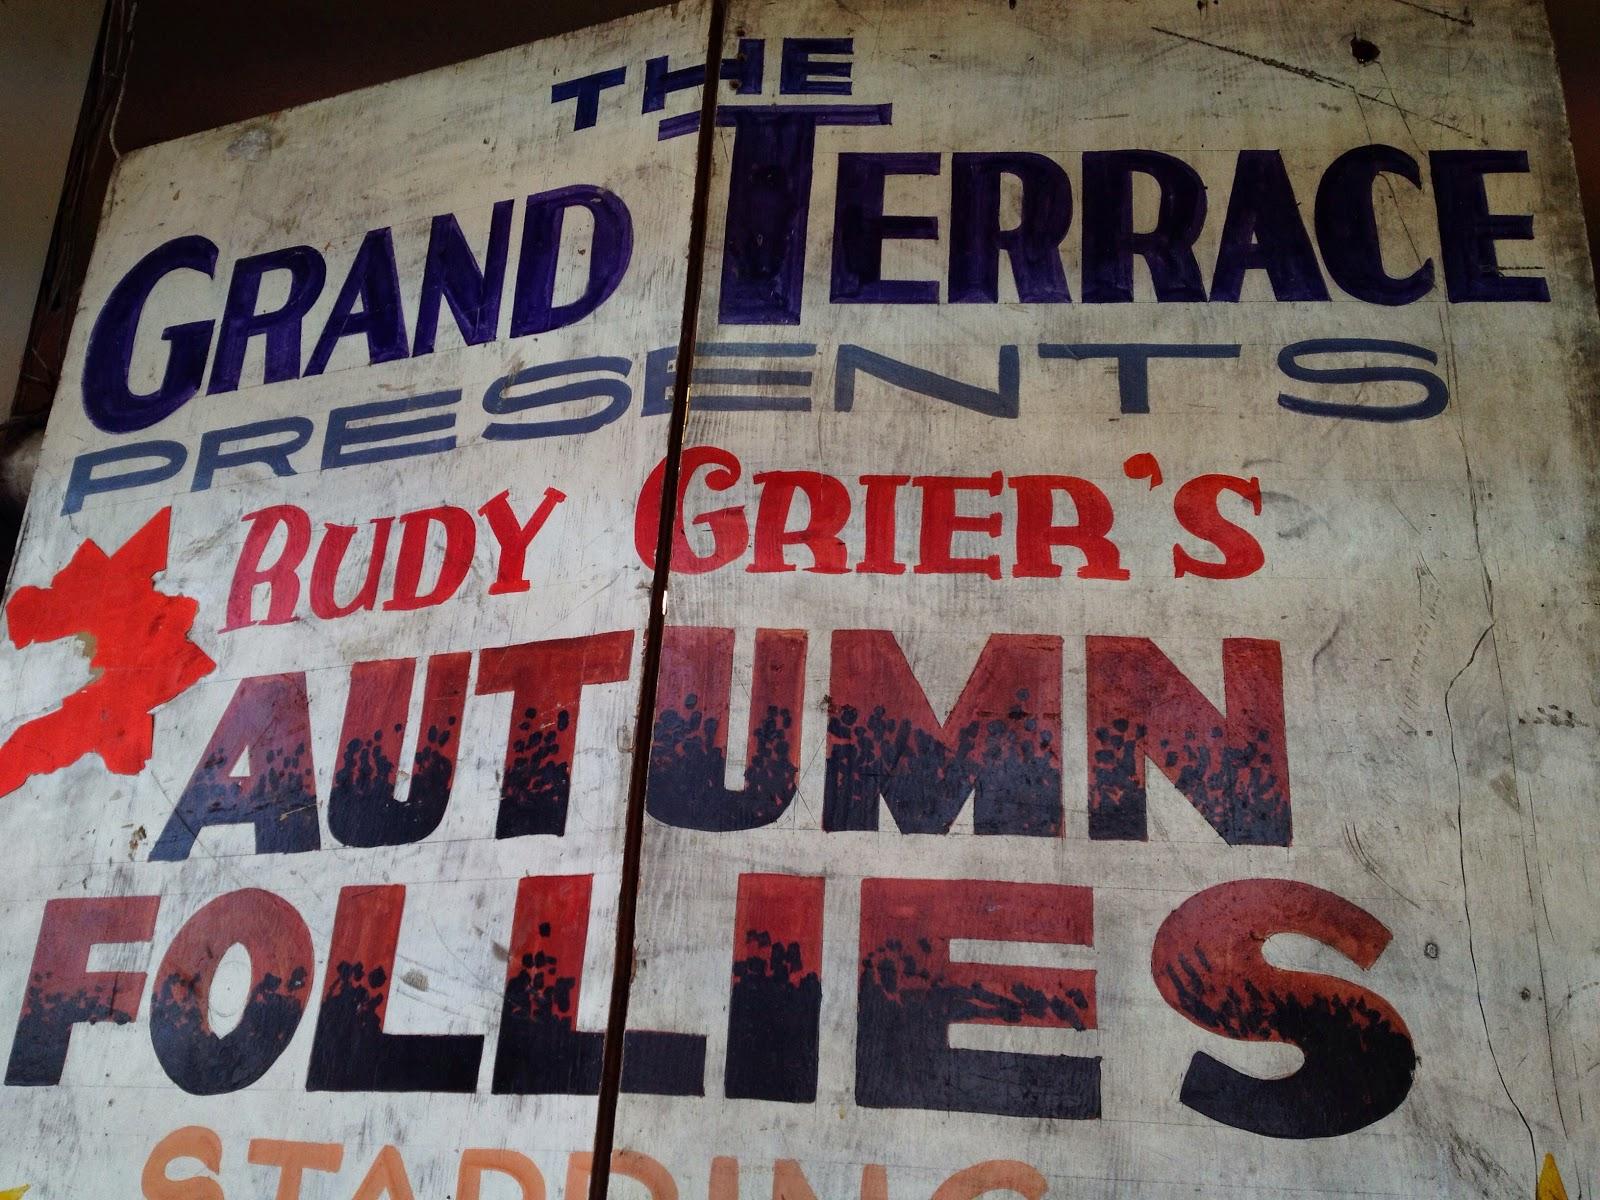 The Grand Terrace Presents Rudy Grier's Autumn Follies